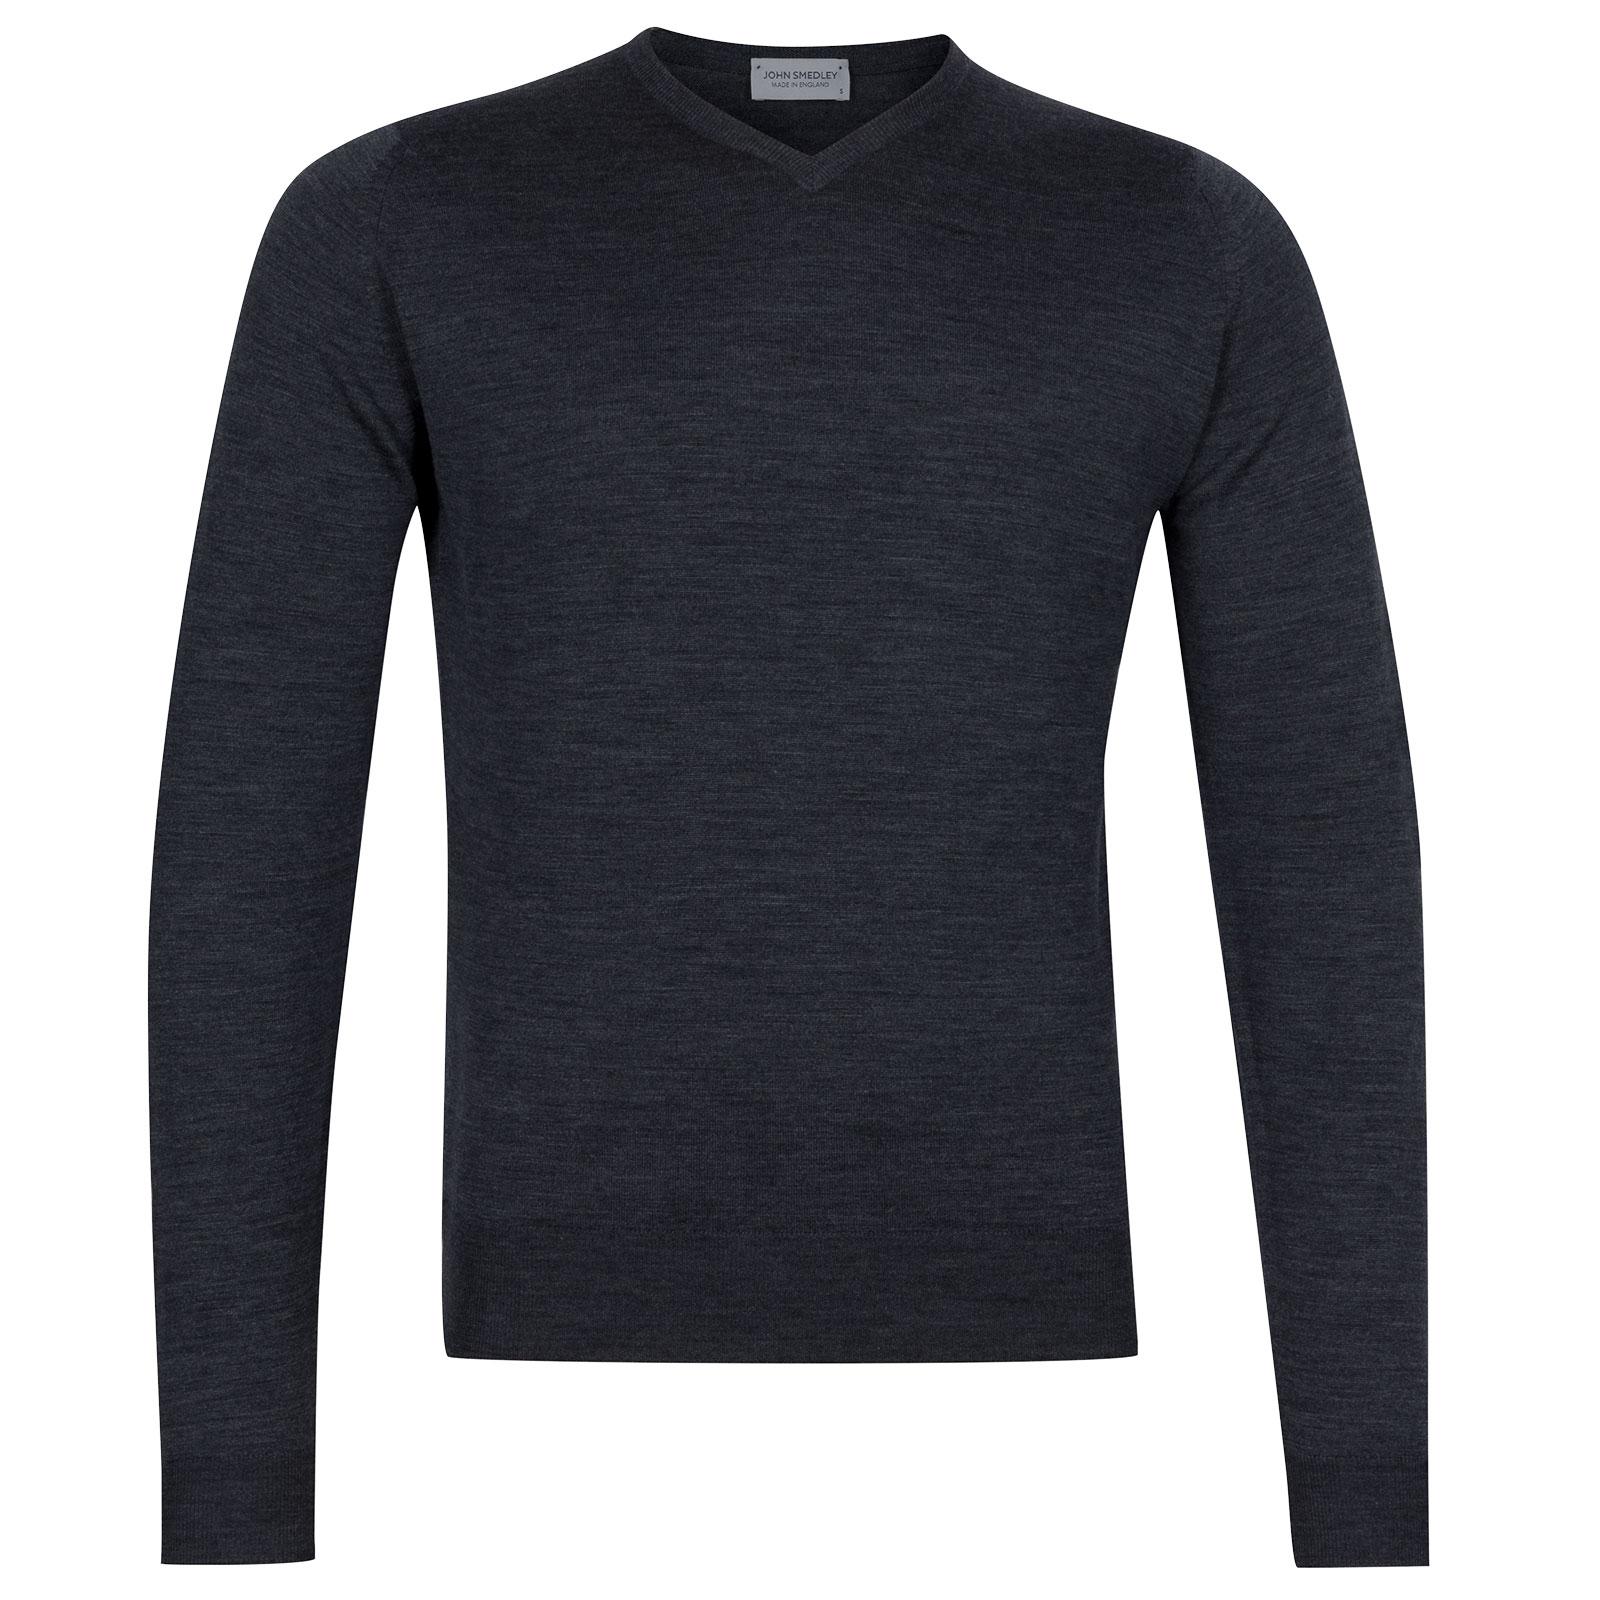 John Smedley Genoa Merino Wool Pullover in Charcoal-XL